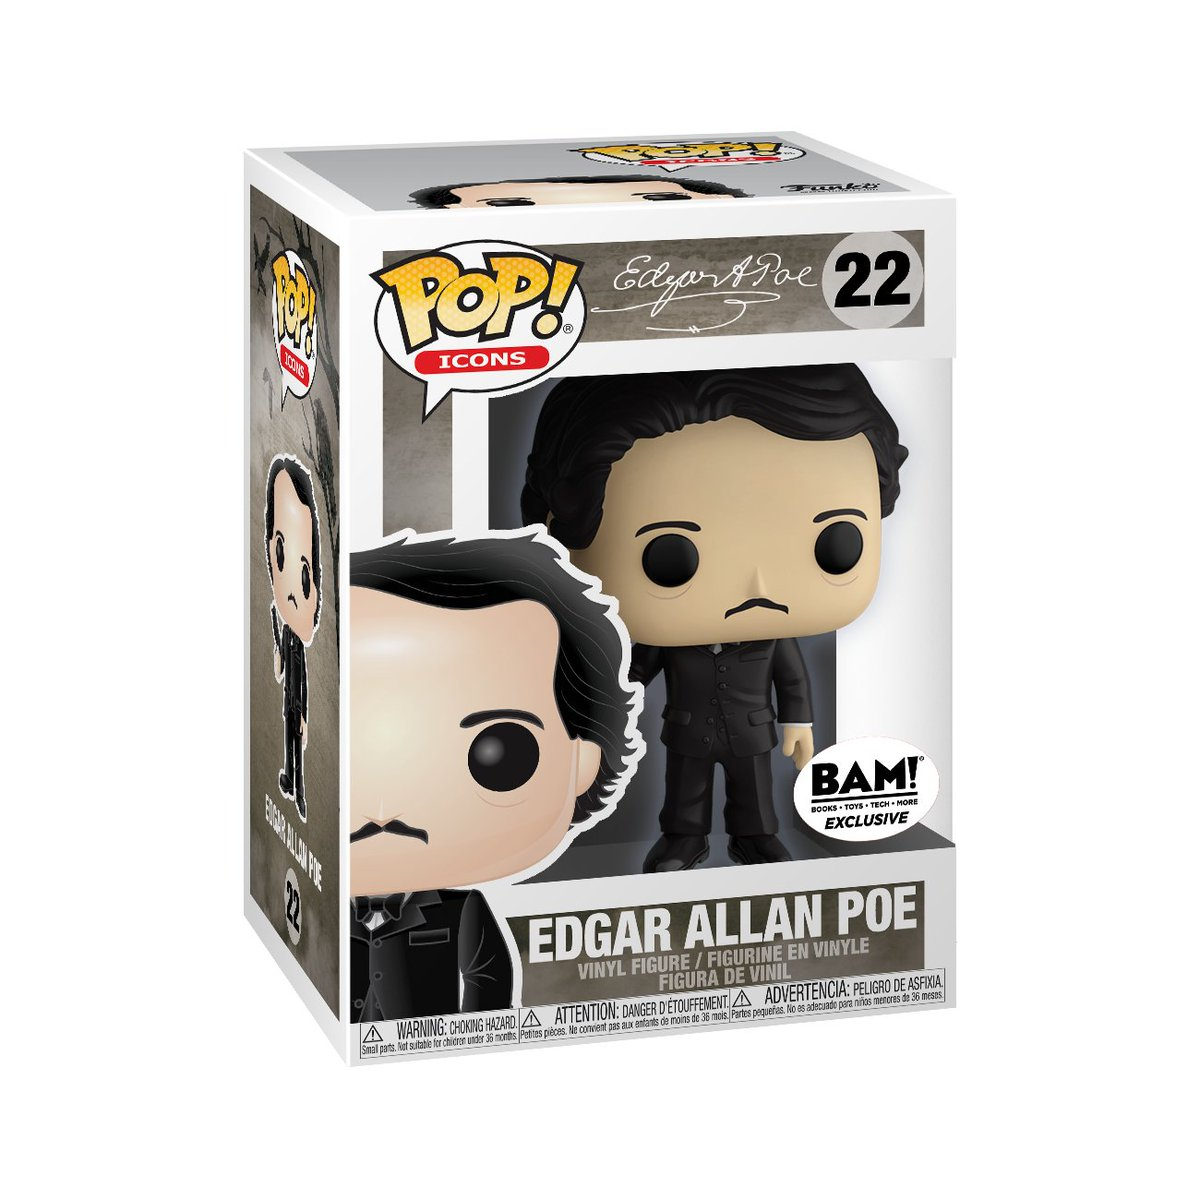 Happy Birthday  to Edgar Allan Poe!  RT & follow @OriginalFunko for a chance to WIN a @booksamillion exclusive Edgar Allan Poe Pop!  #Funko #FunkoPop #Giveaway #pop #exclusive #EdgarAllanPoe #HBD<br>http://pic.twitter.com/qJDpn5z3On